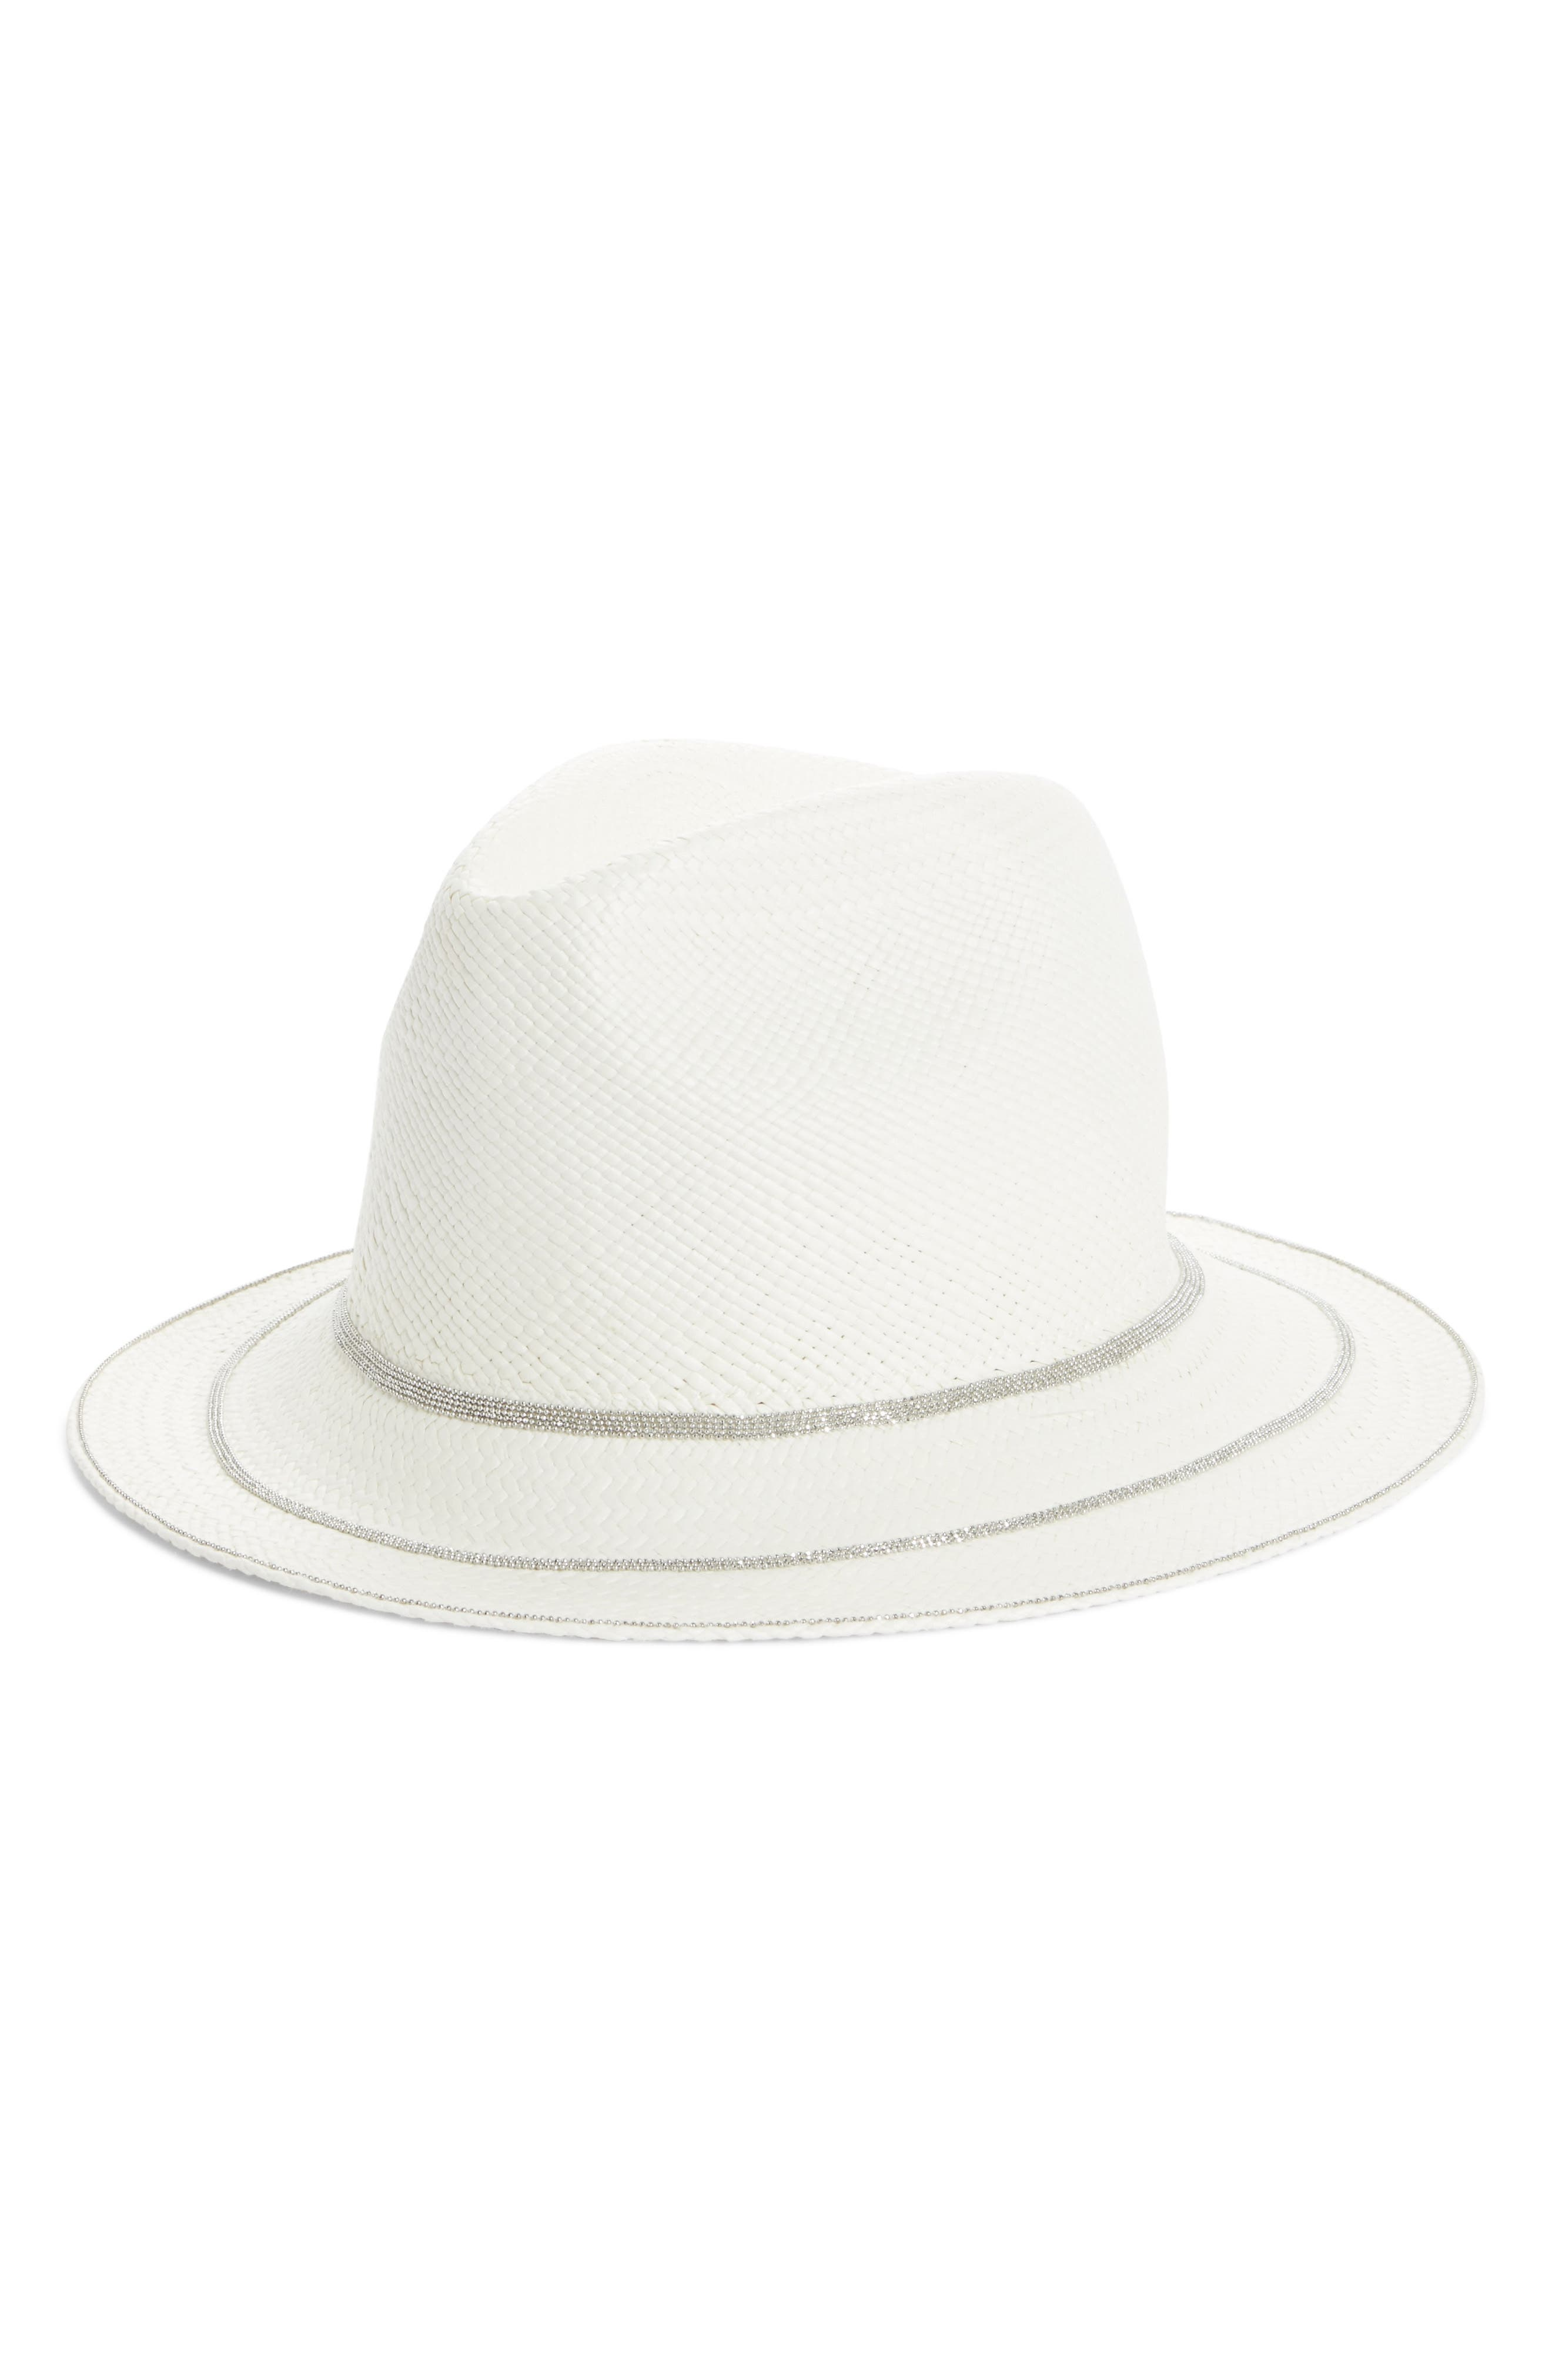 Alternate Image 1 Selected - Fabiana Filippi Triple Layer Bead Straw Hat